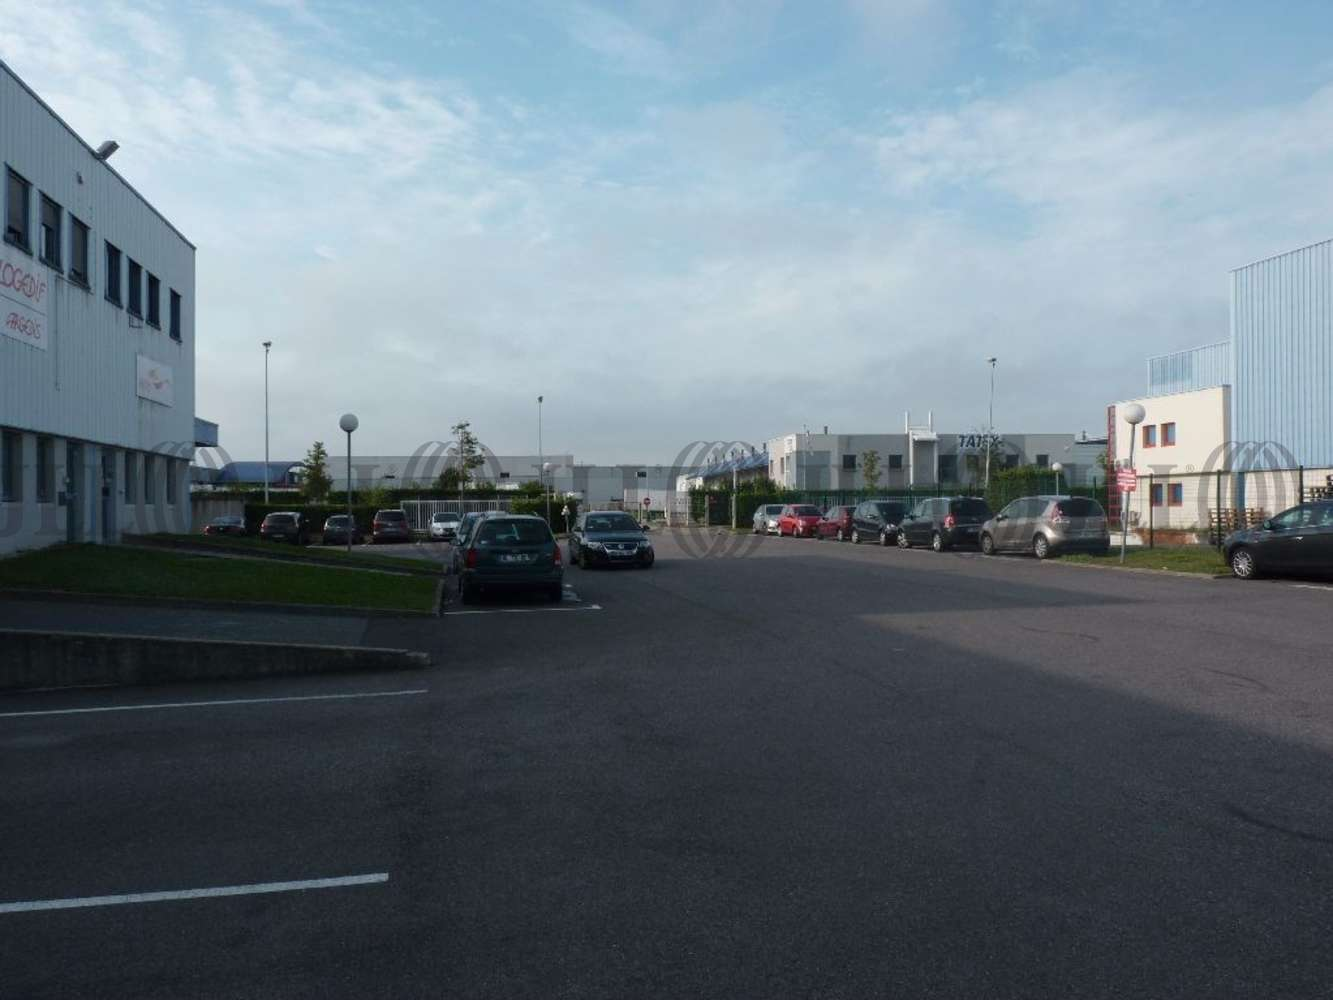 Activités/entrepôt Genas, 69740 - Location entrepot Genas - Lyon Est (69) - 10322579